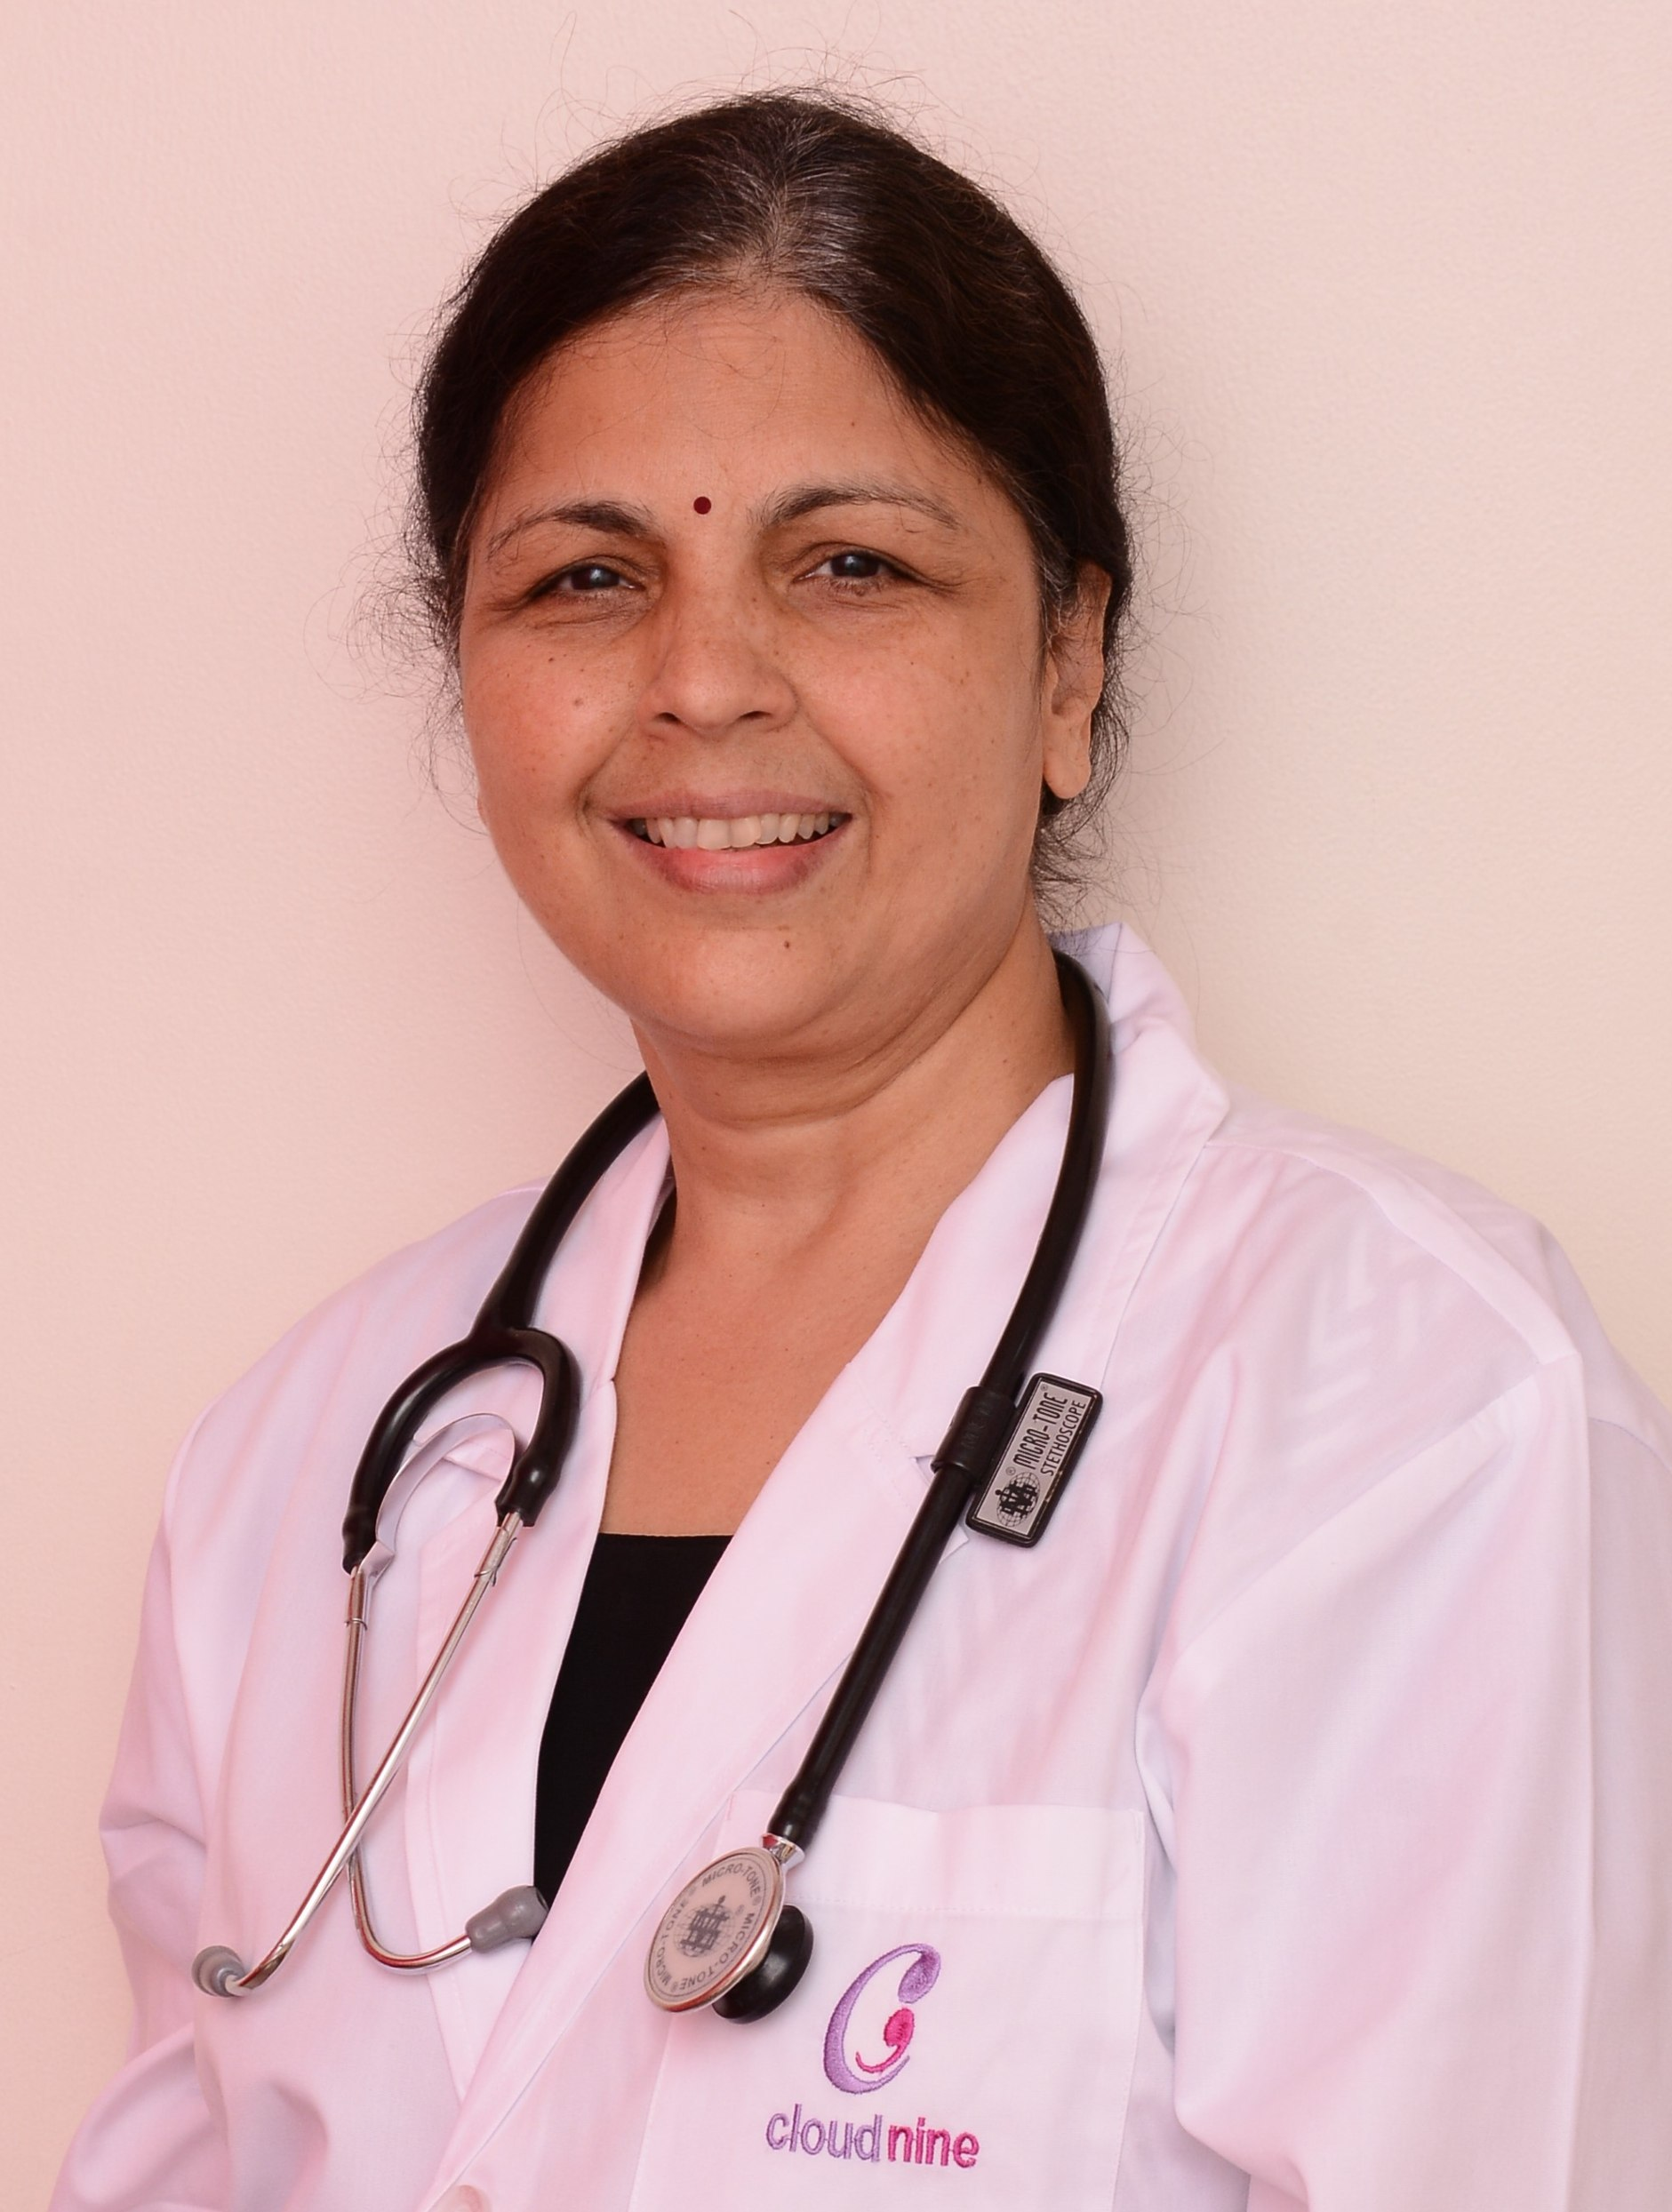 Dr. Sudhamathy Kannan